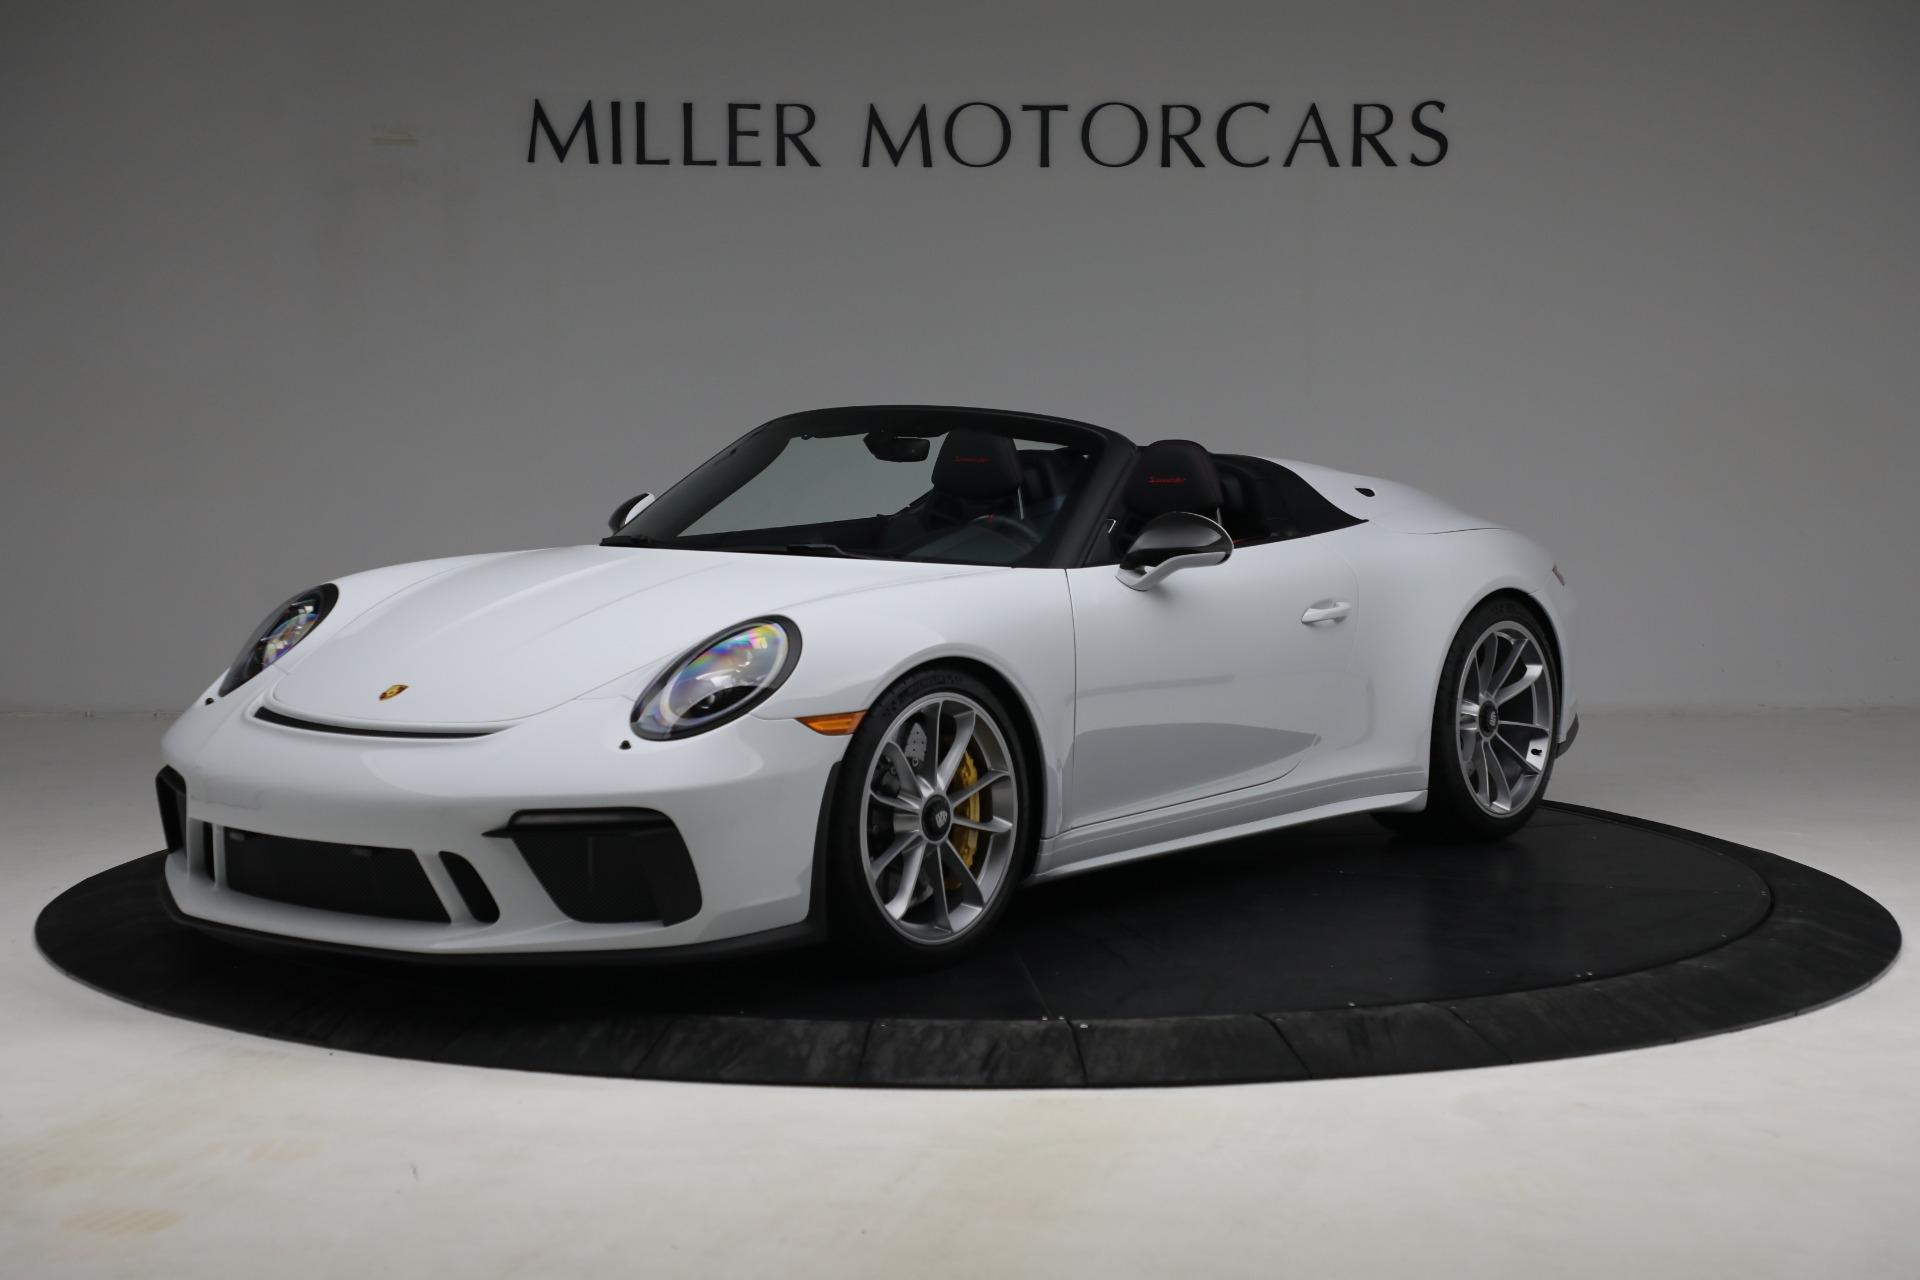 Used 2019 Porsche 911 Speedster for sale $395,900 at McLaren Greenwich in Greenwich CT 06830 1